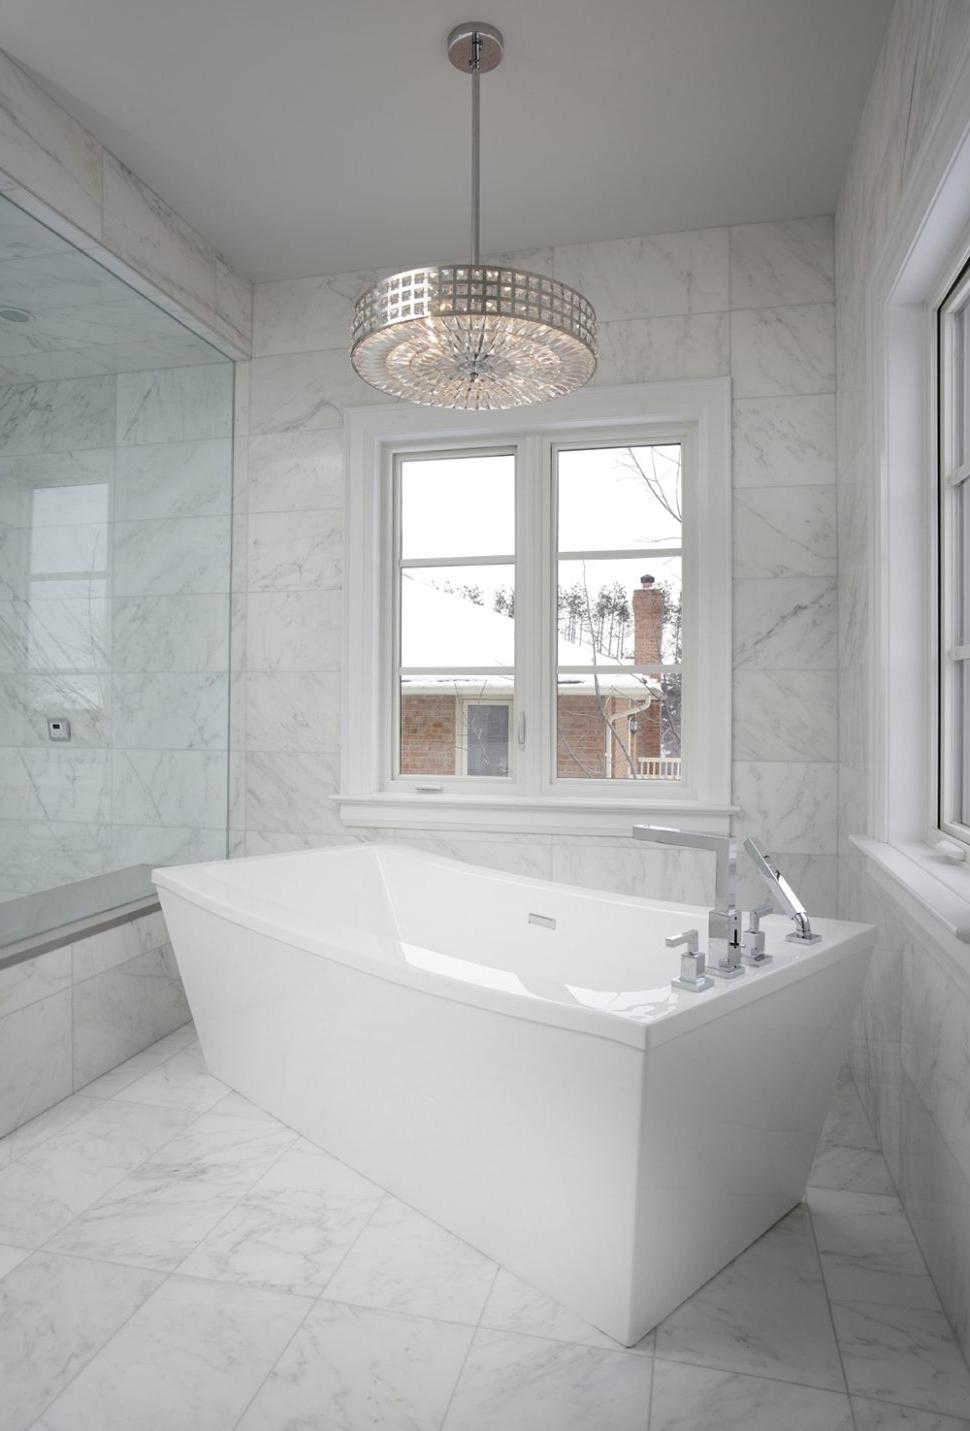 Chandeliers Design : Marvelous Dining Chandelier Rectangular Shades Inside Favorite Mini Chandelier Bathroom Lighting (View 6 of 20)